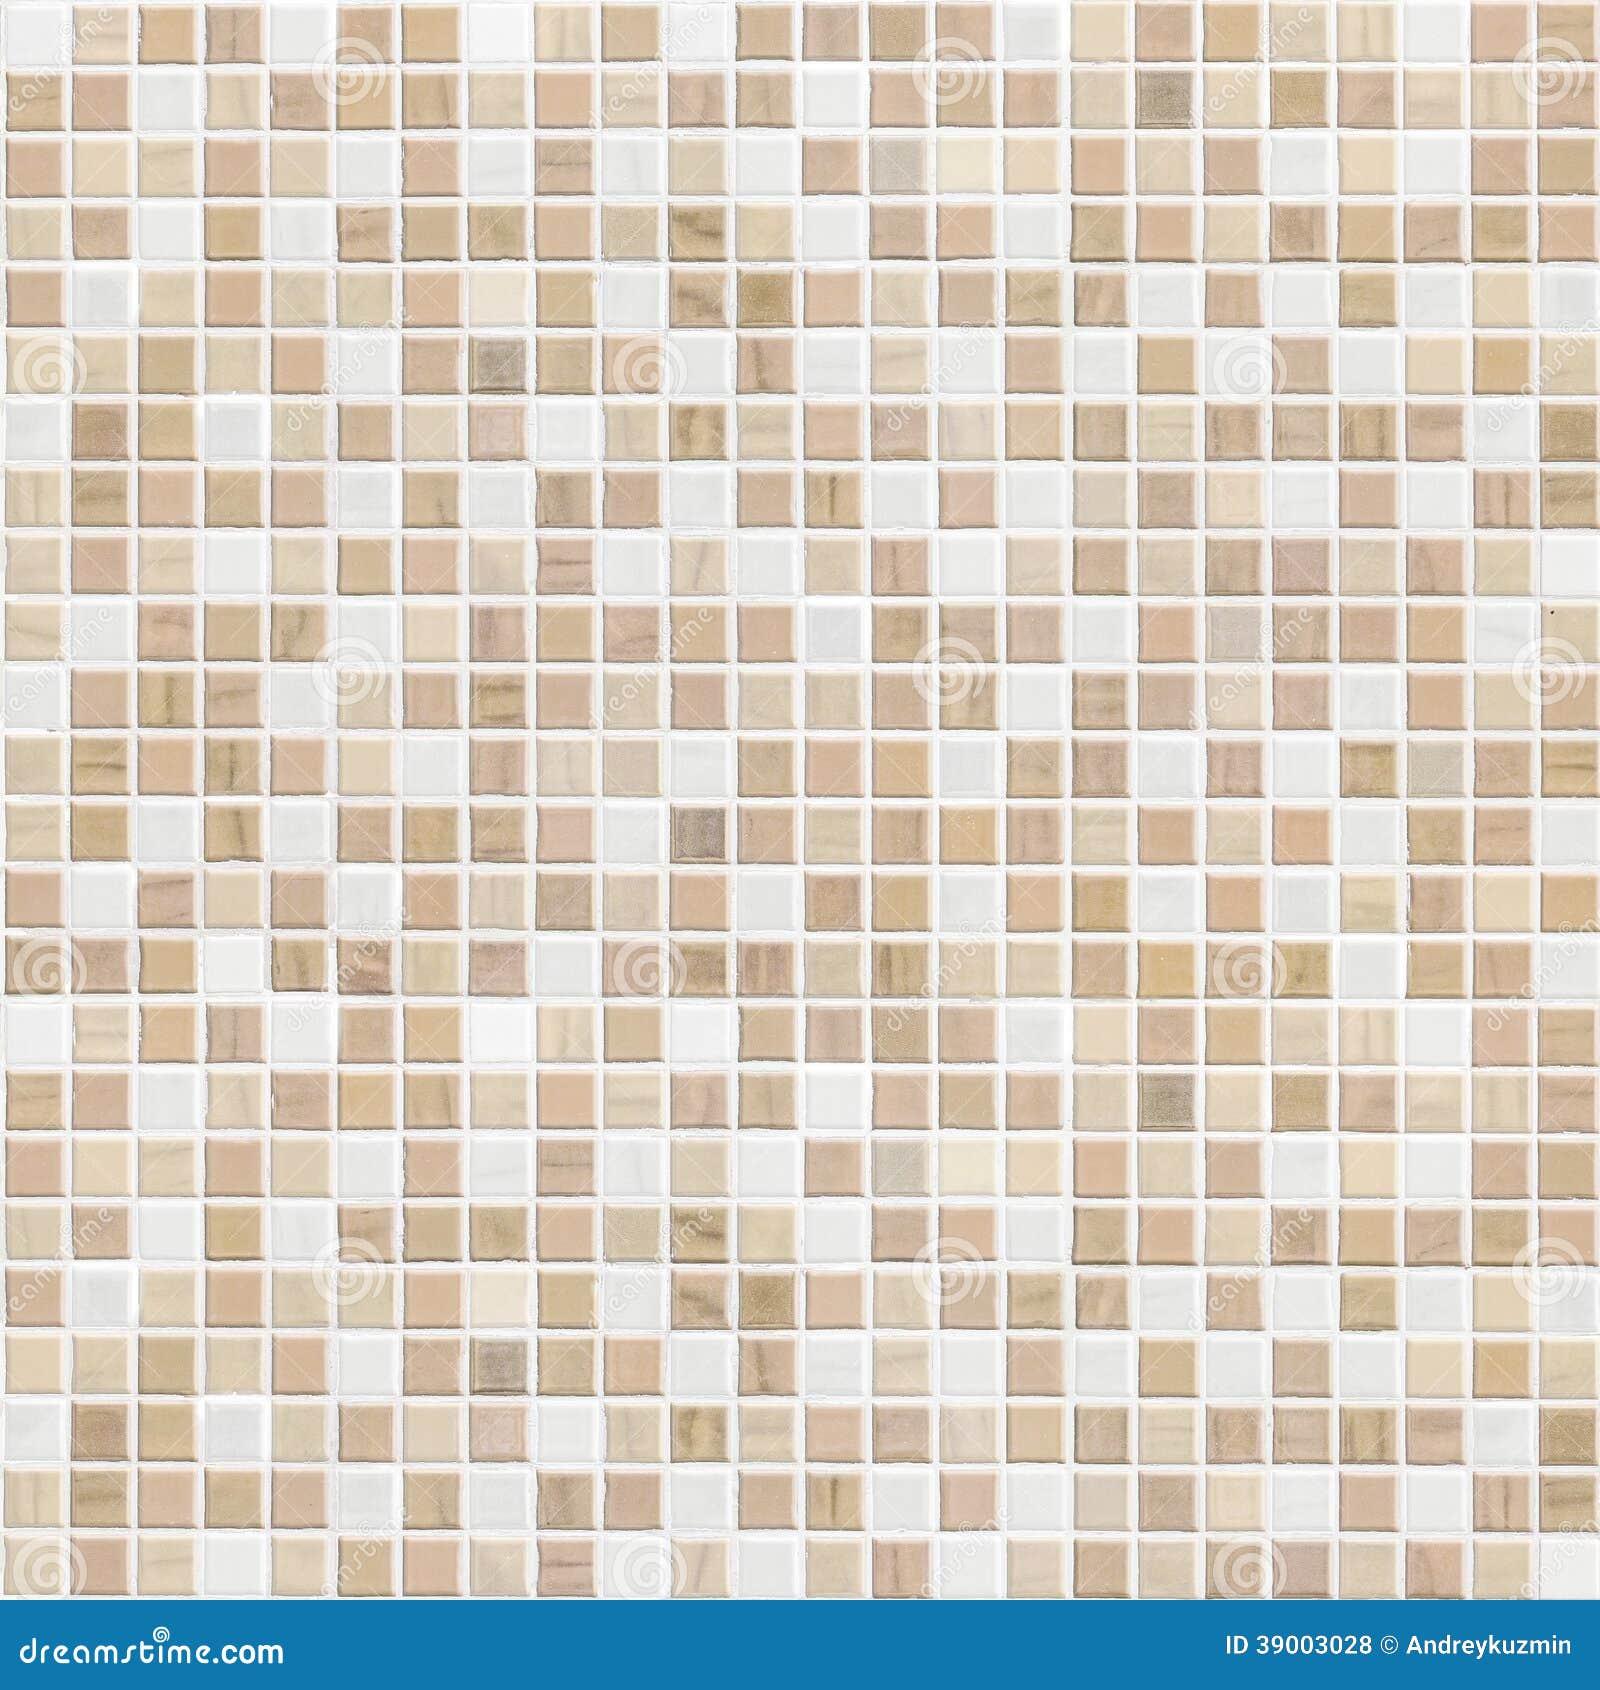 Mosaic Tile Wall